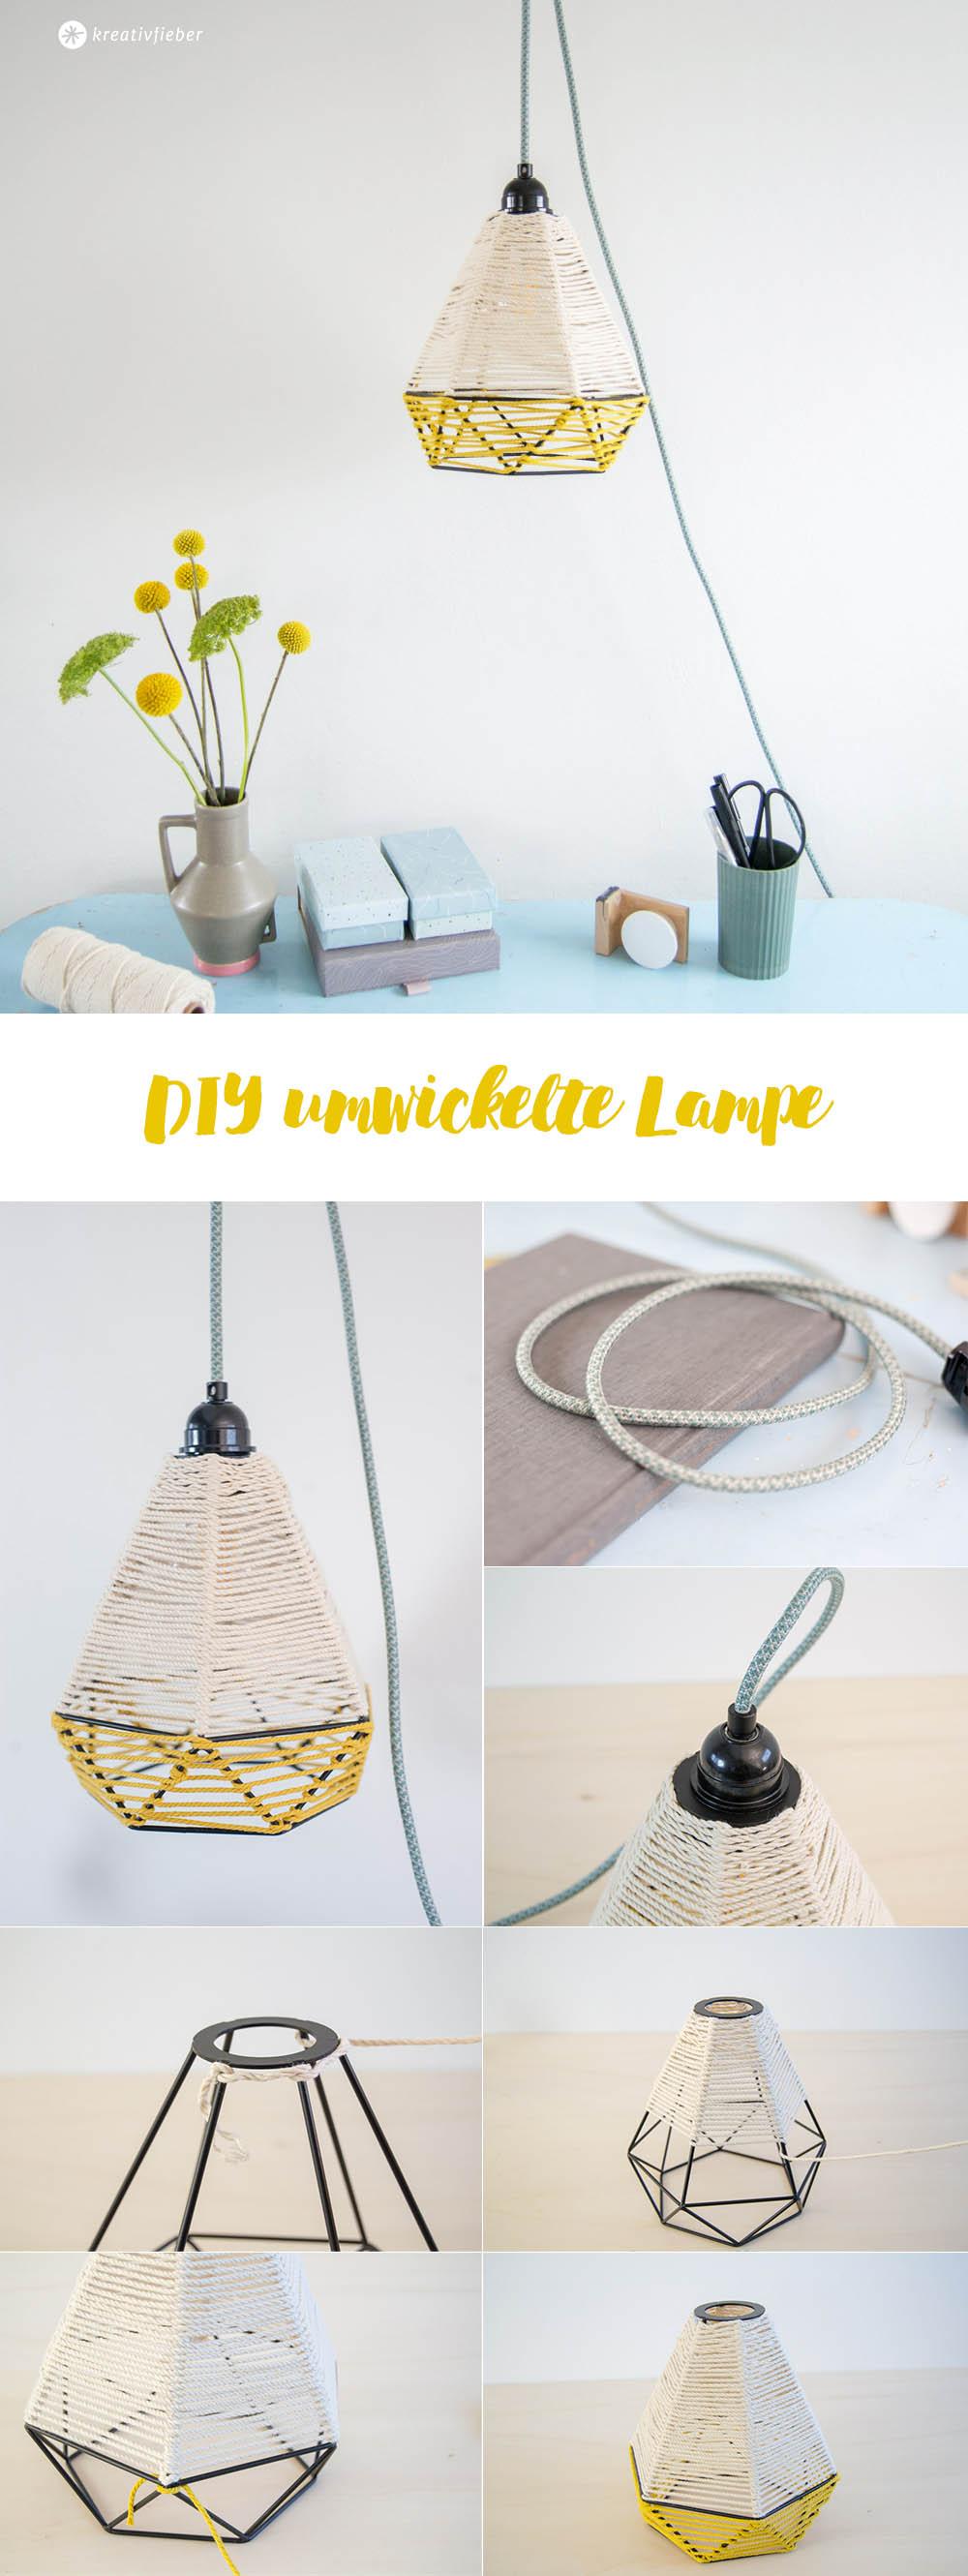 DIY Lampe bauen mit Kordel umwickeln